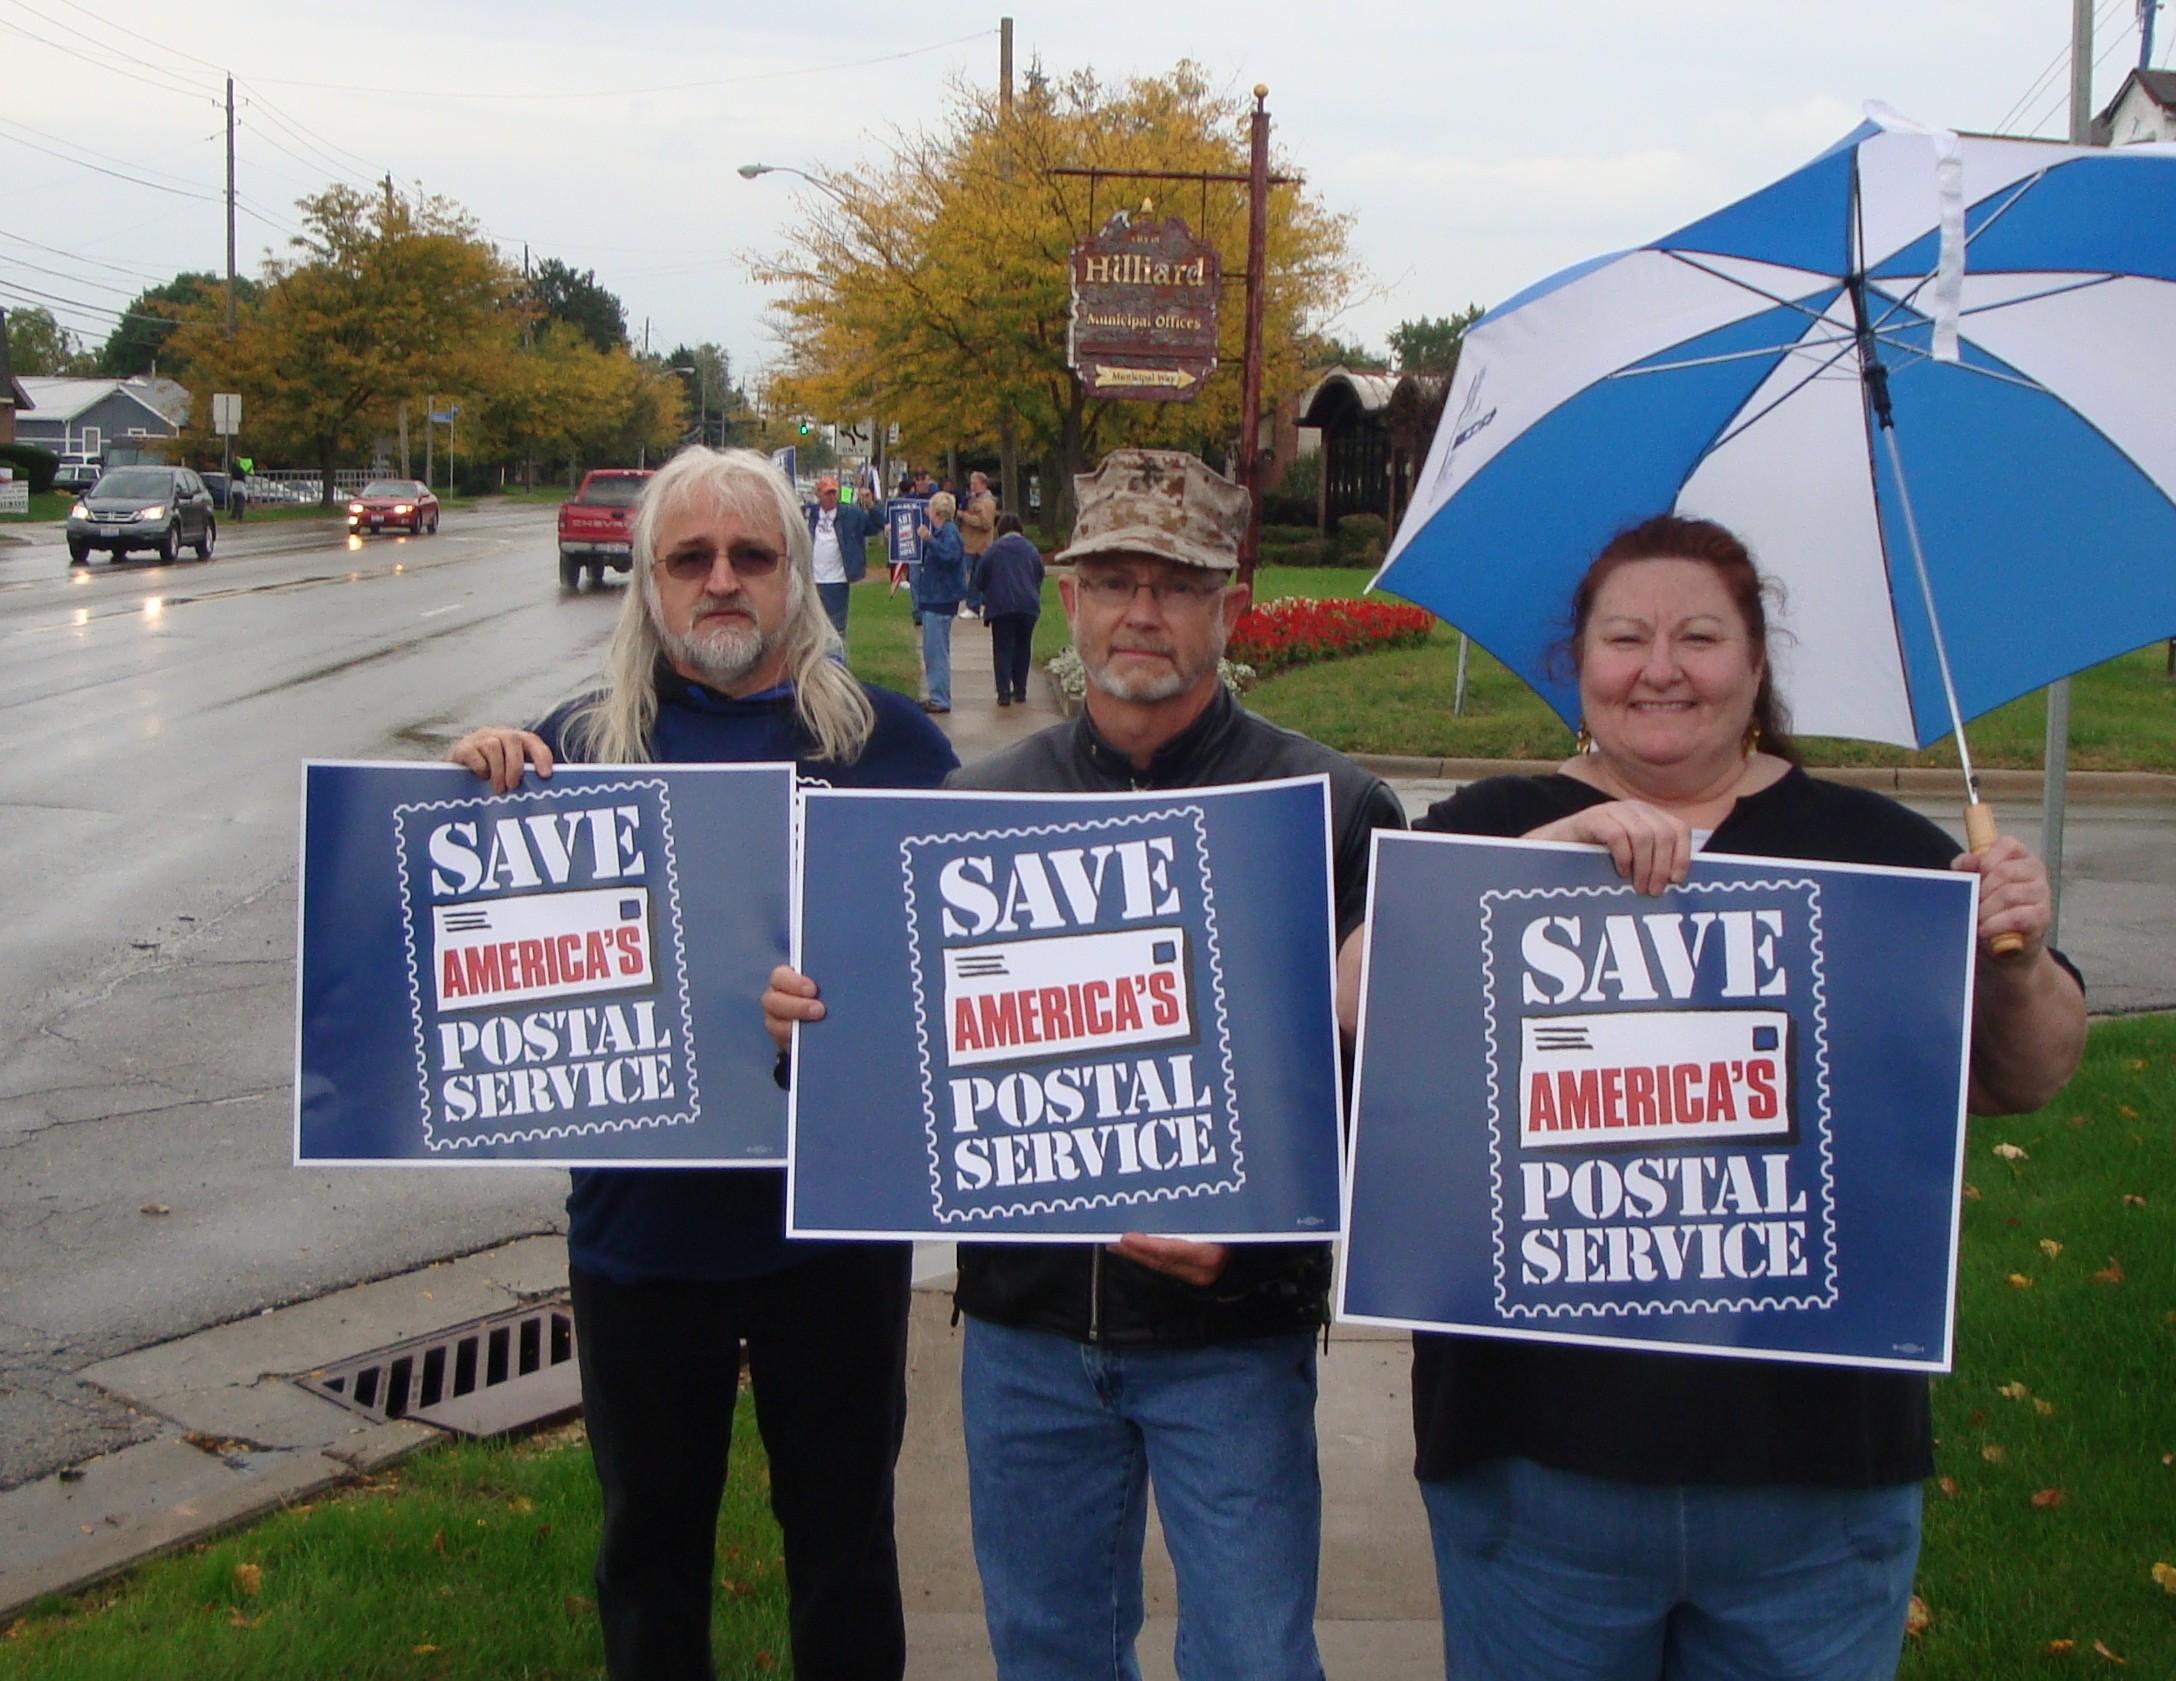 save-postal-service-rally-9-27-11-039_6302204136_o.jpg